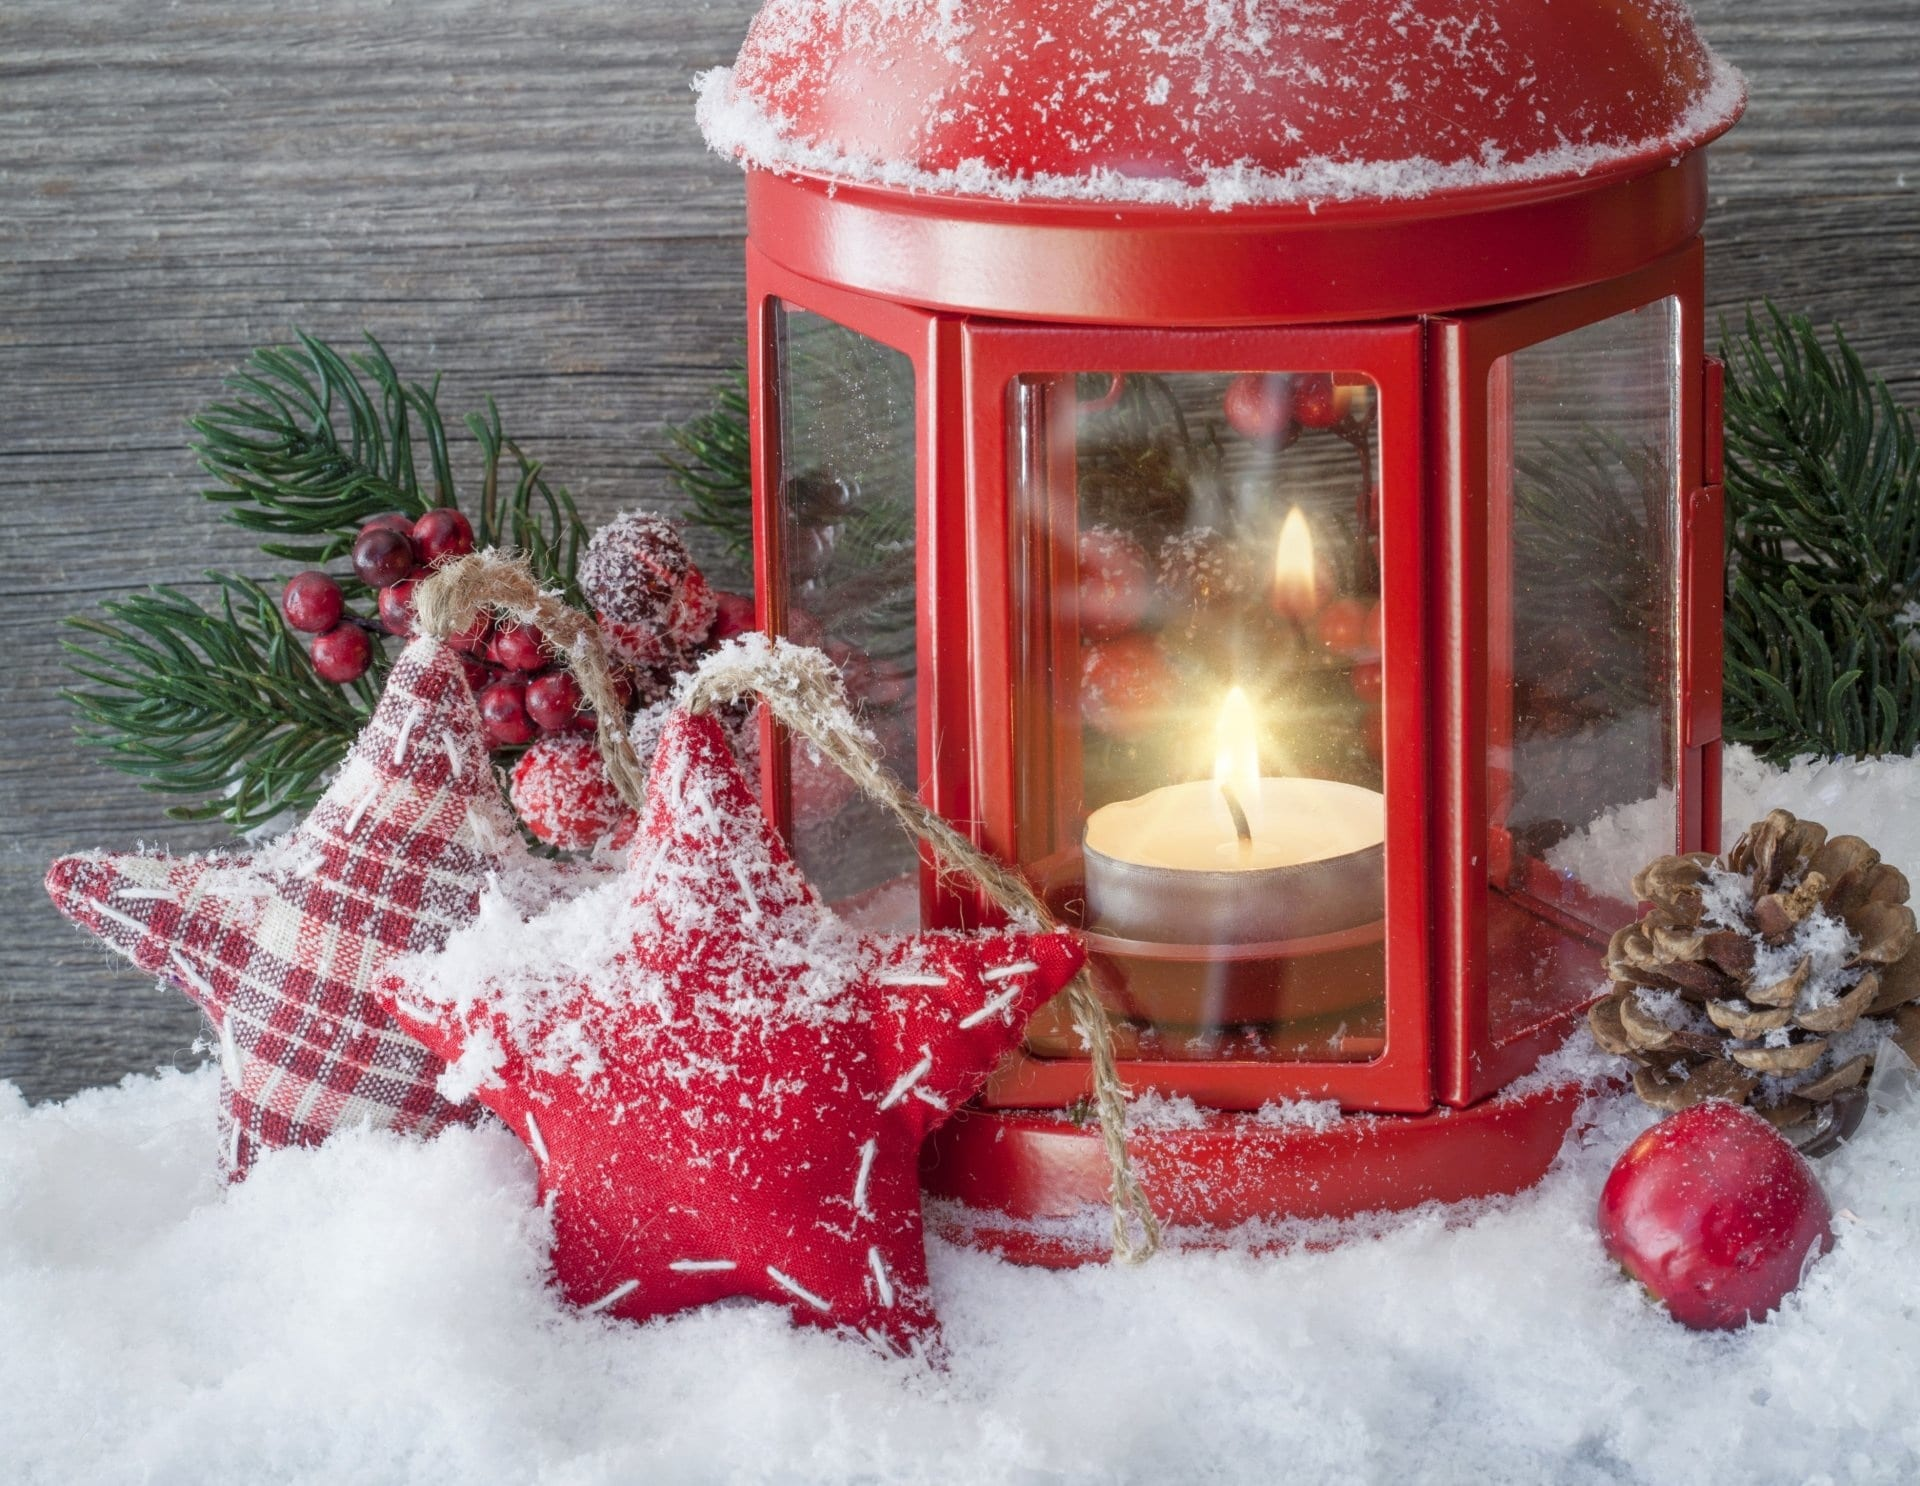 Steve Landers Toyota NWA | Tips to Keep Up the Christmas Cheer ...